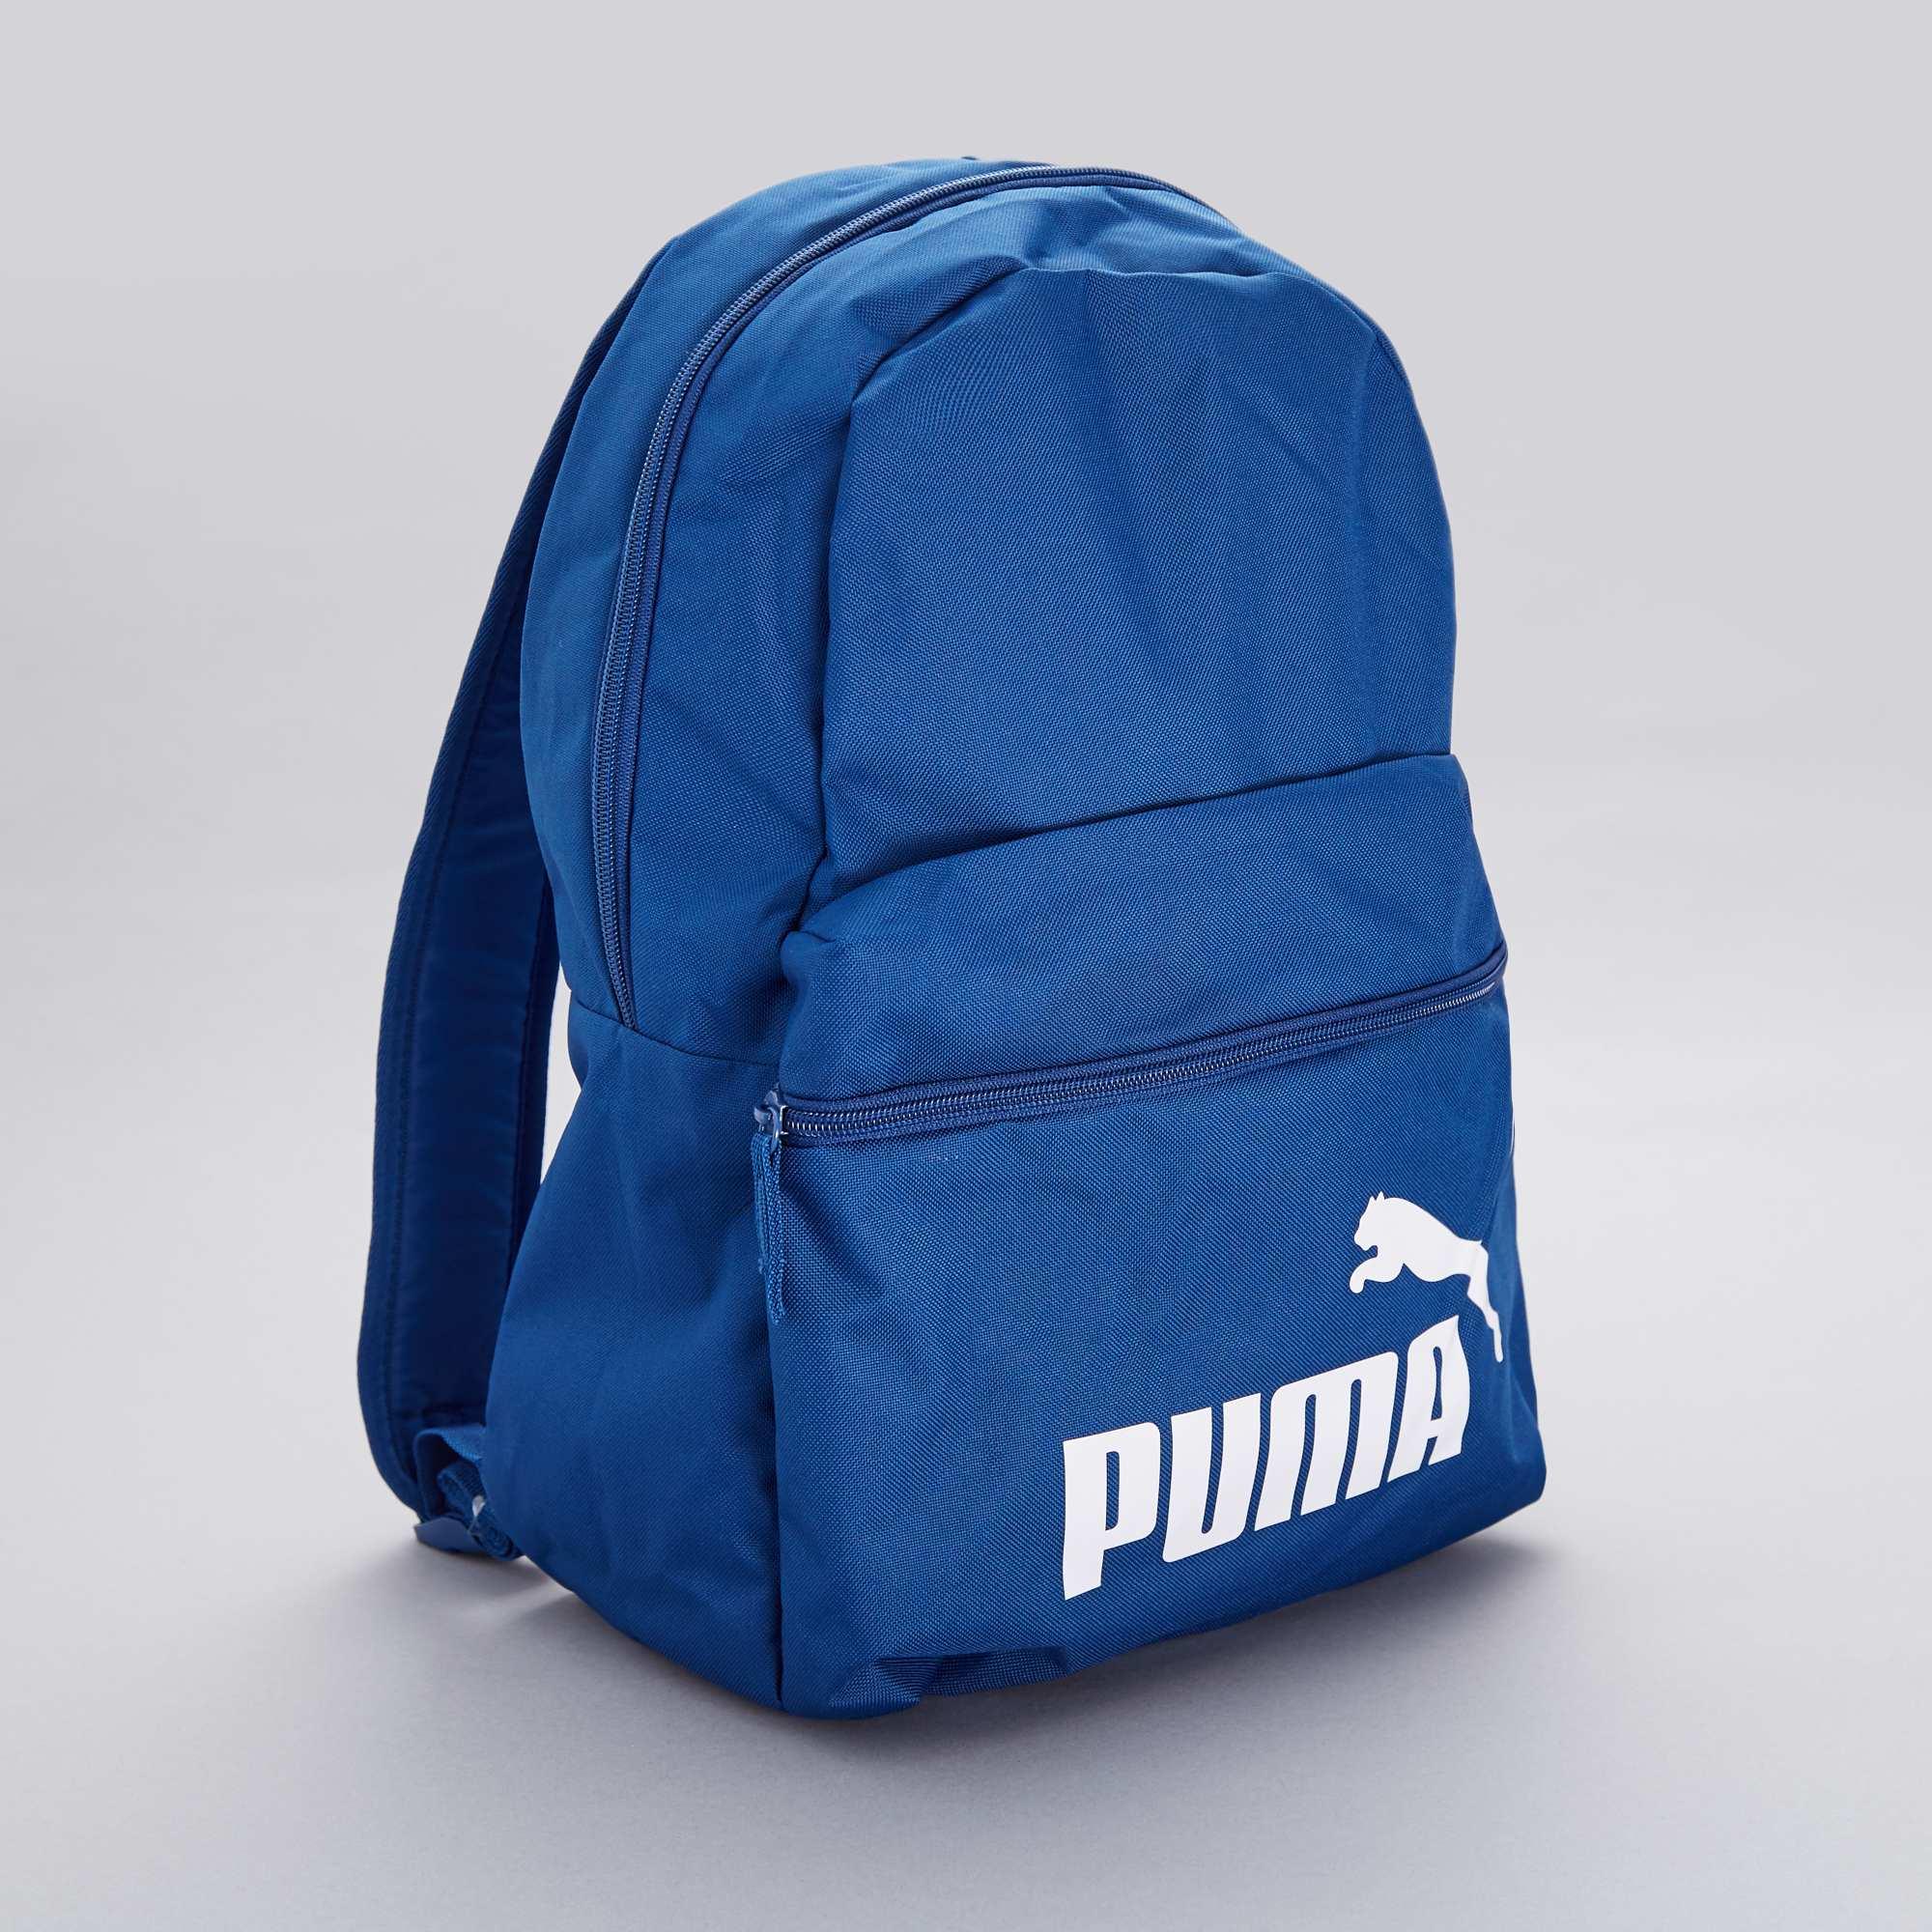 ff690c4d20 Sac à dos 'Puma' Garçon adolescent - bleu - Kiabi - 20,00€